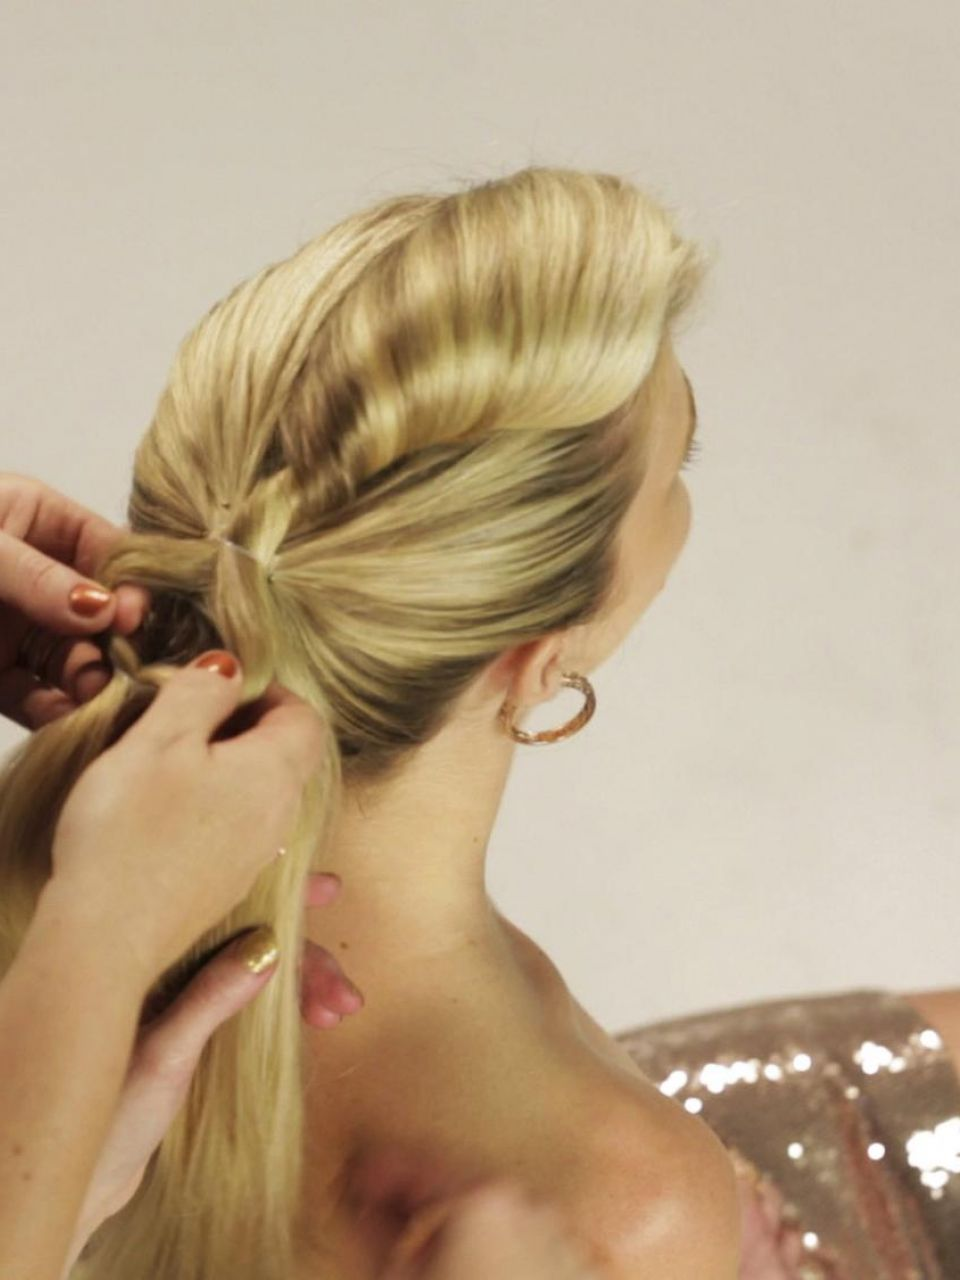 Die Methoden gegen den Haarausfall